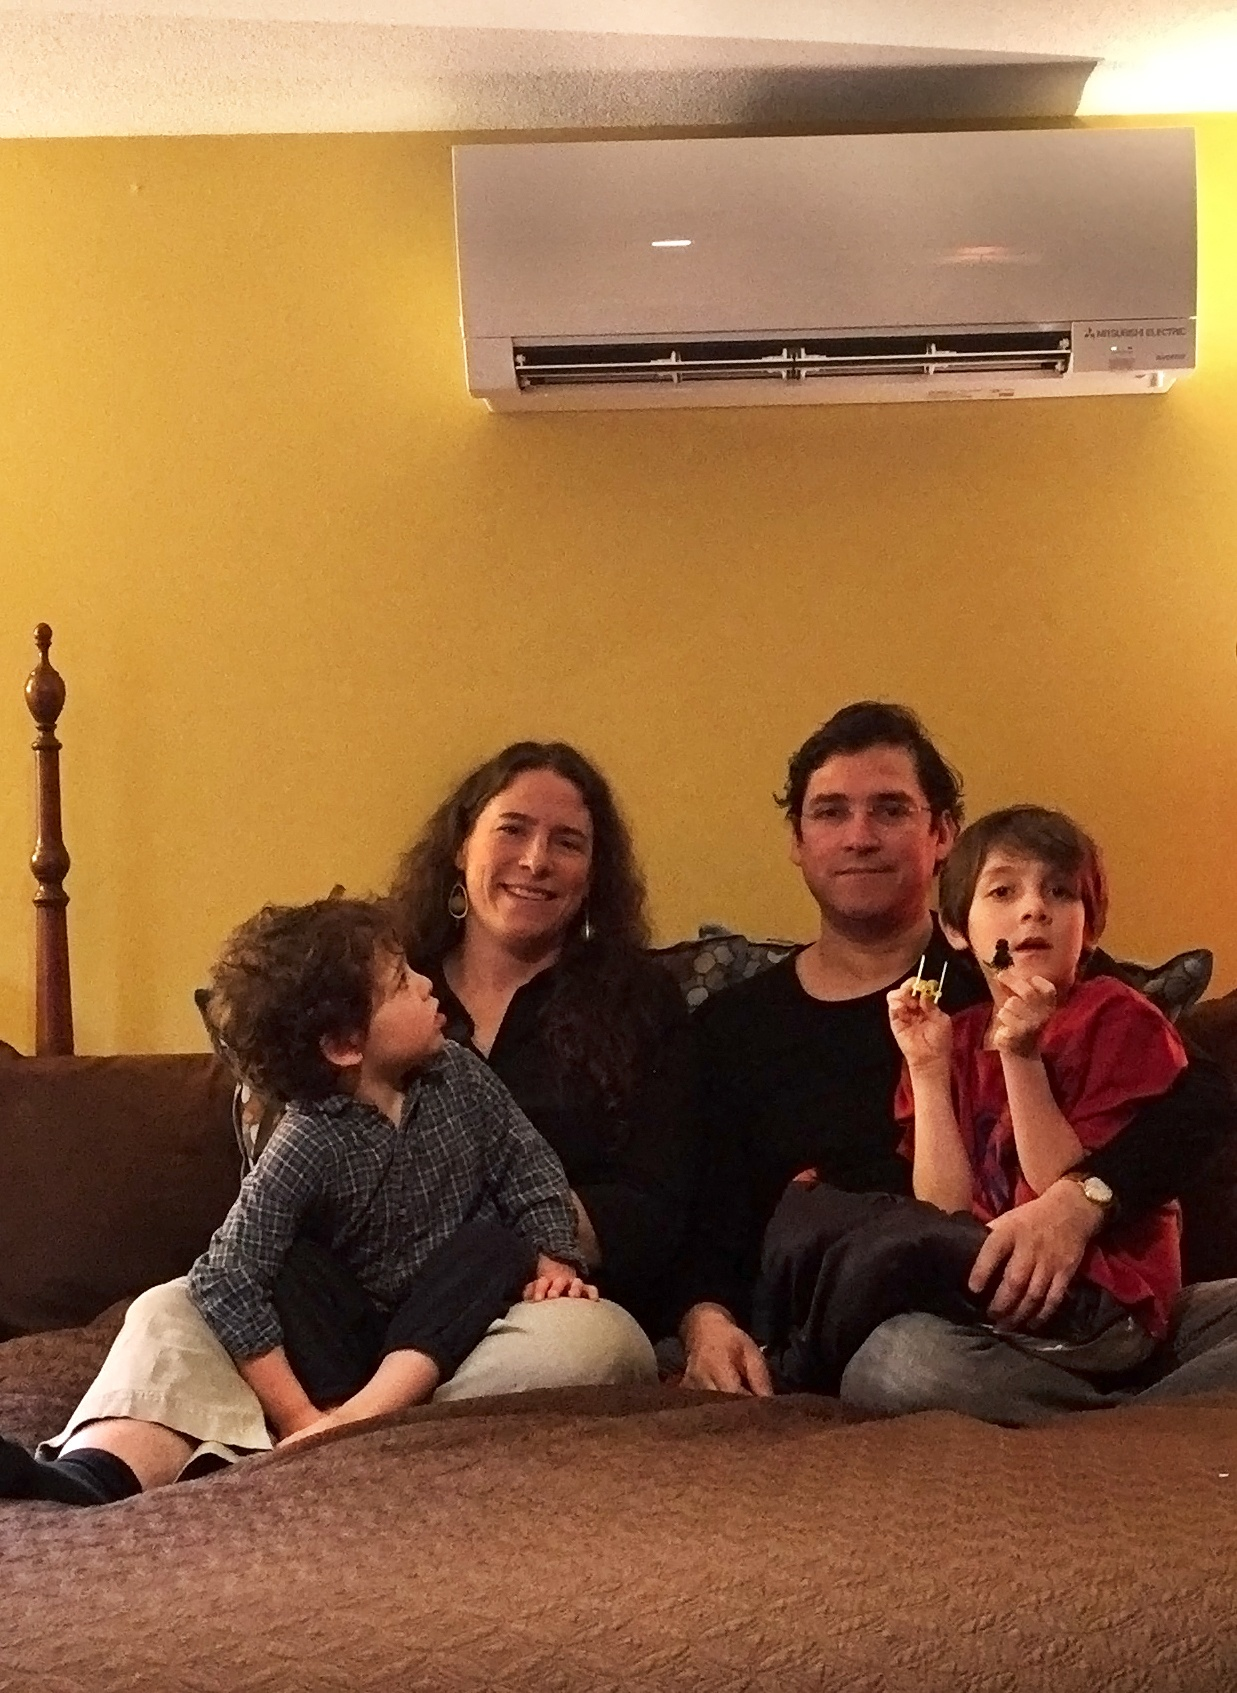 Family_with_Heat_Pump_Ricard_Torres-Mateluna.jpg